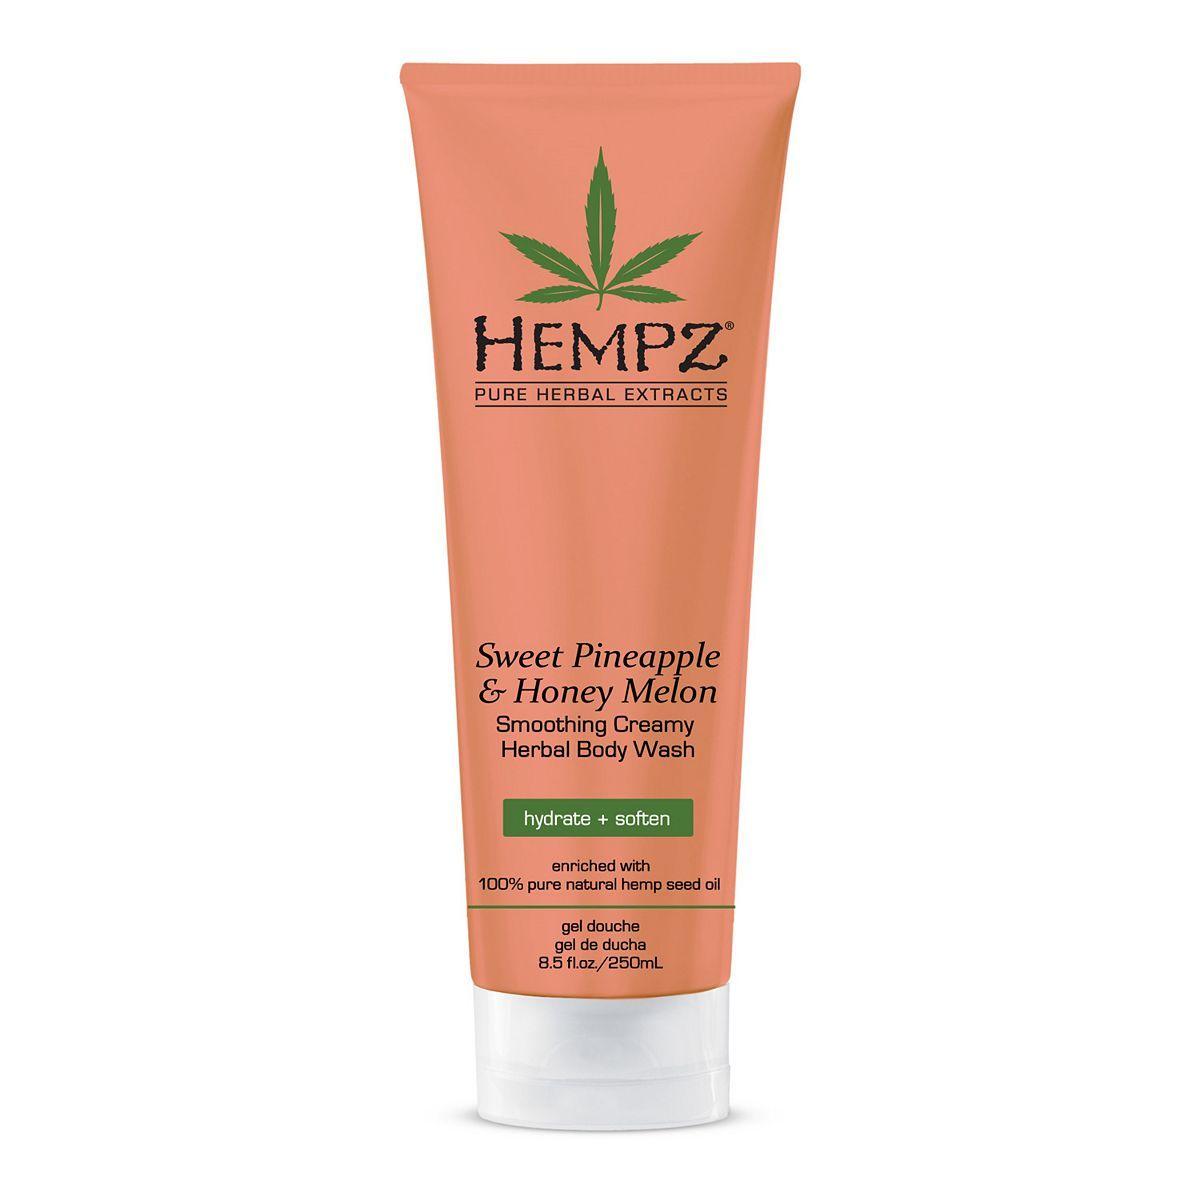 Hempz Sweet Pineapple & Honey Melon Body Wash  8.5oz